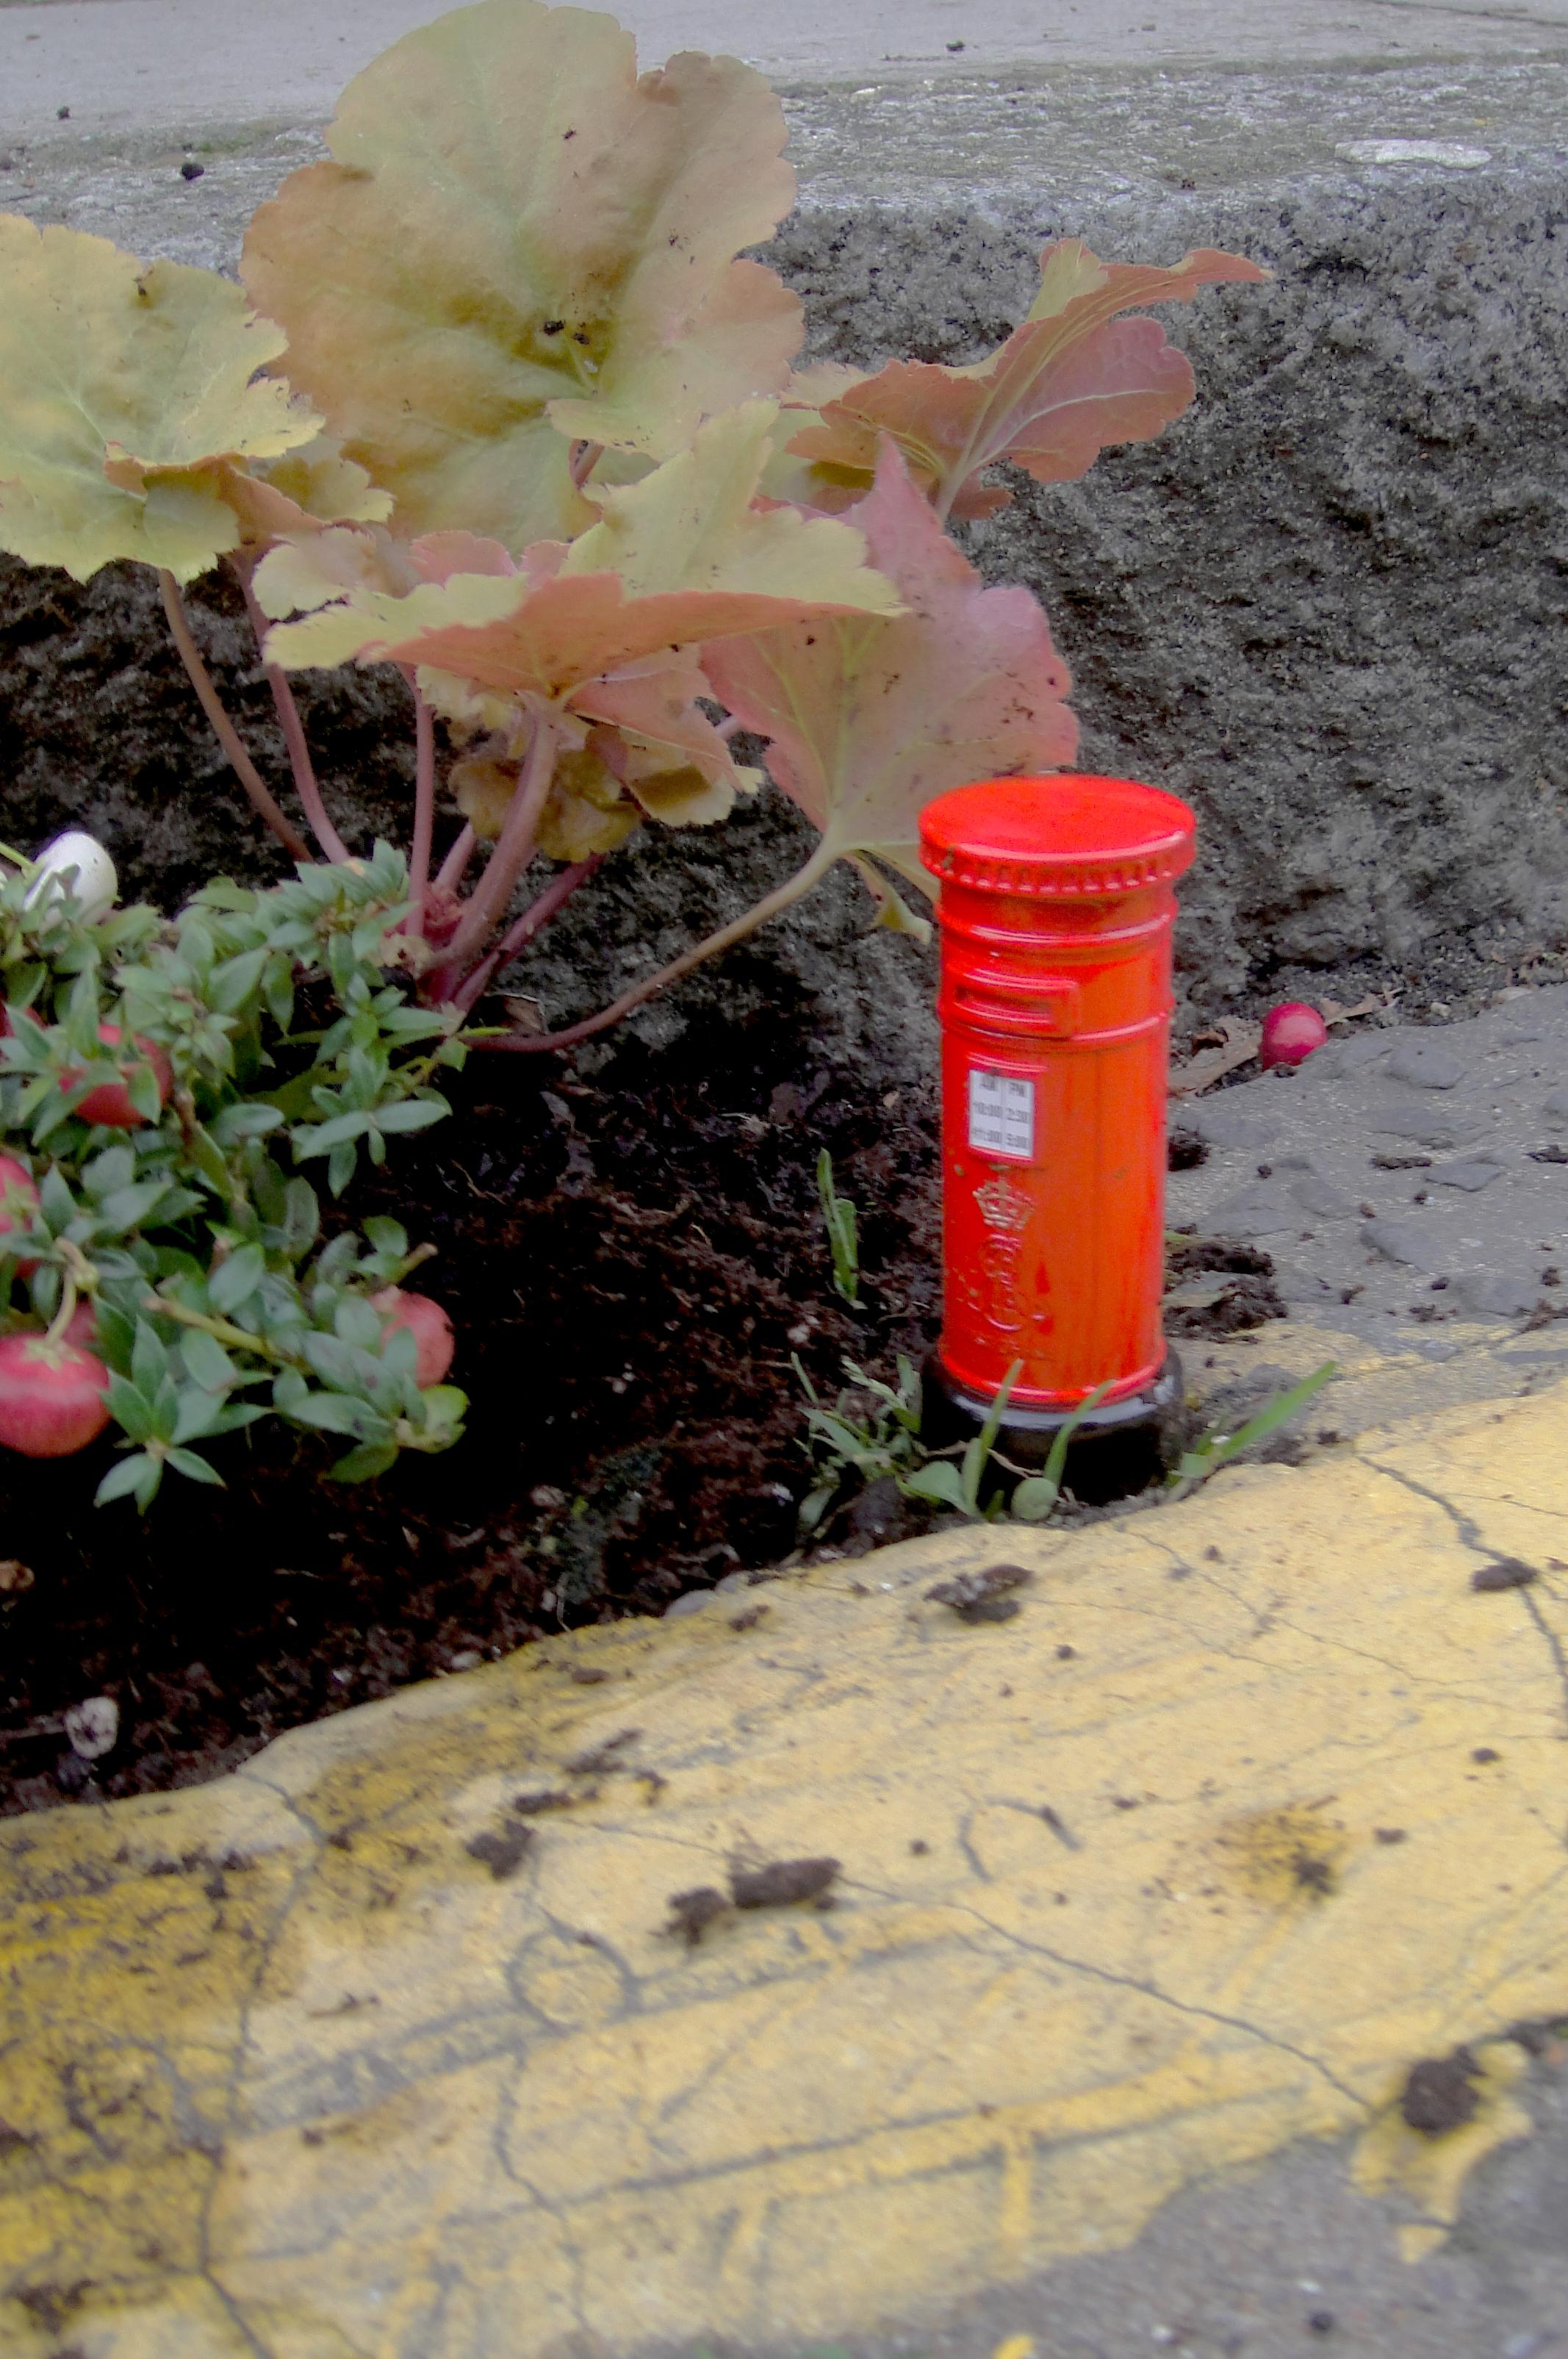 pothole-garden-royal-post-post-box-east-london-cu.jpg